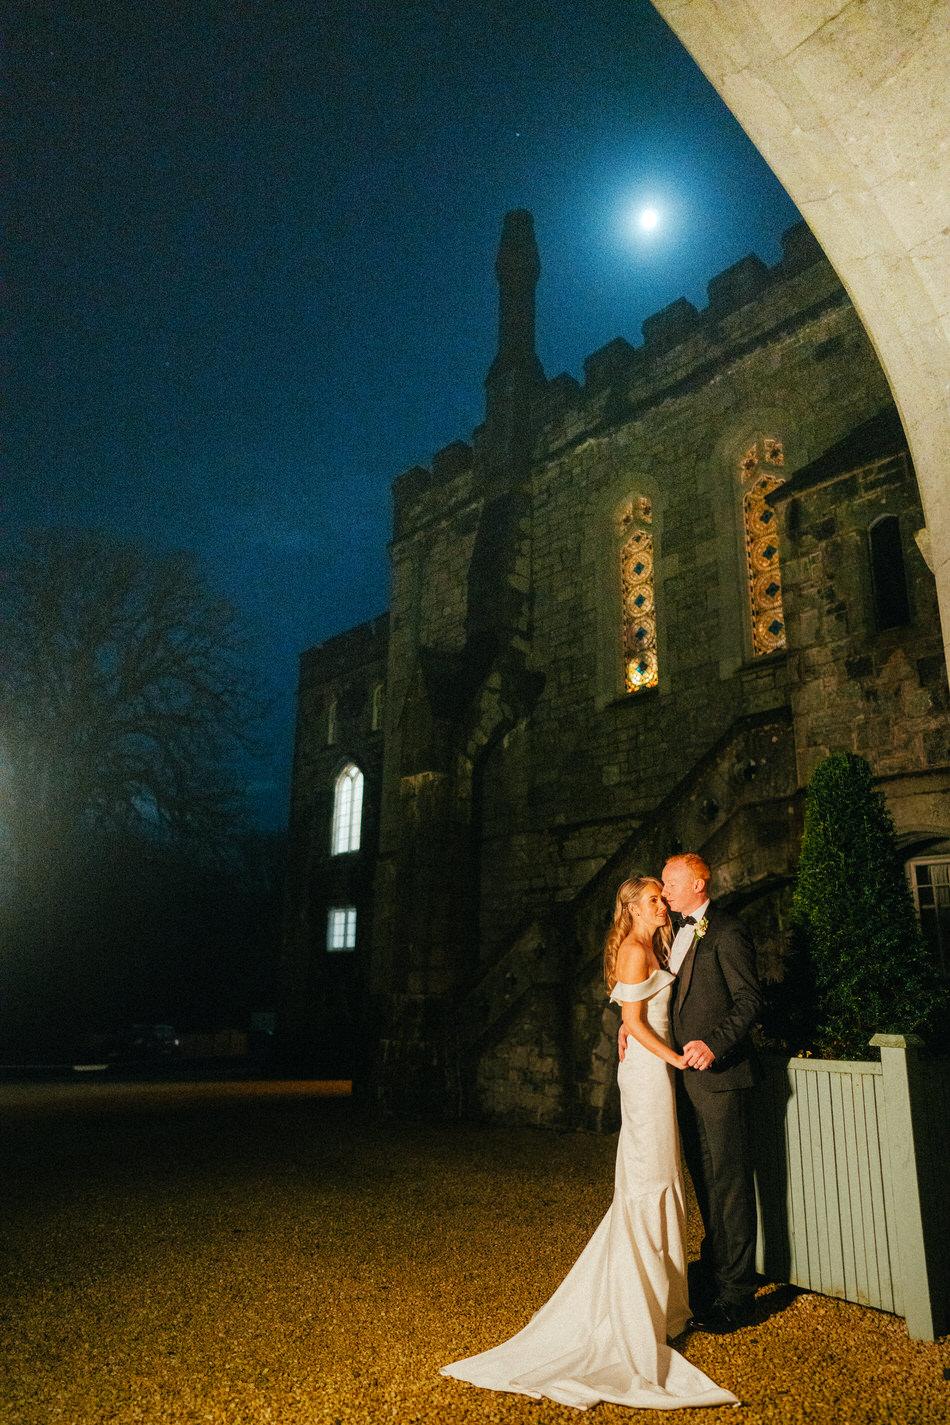 Castle-wedding-ireland-photos- 0354 264